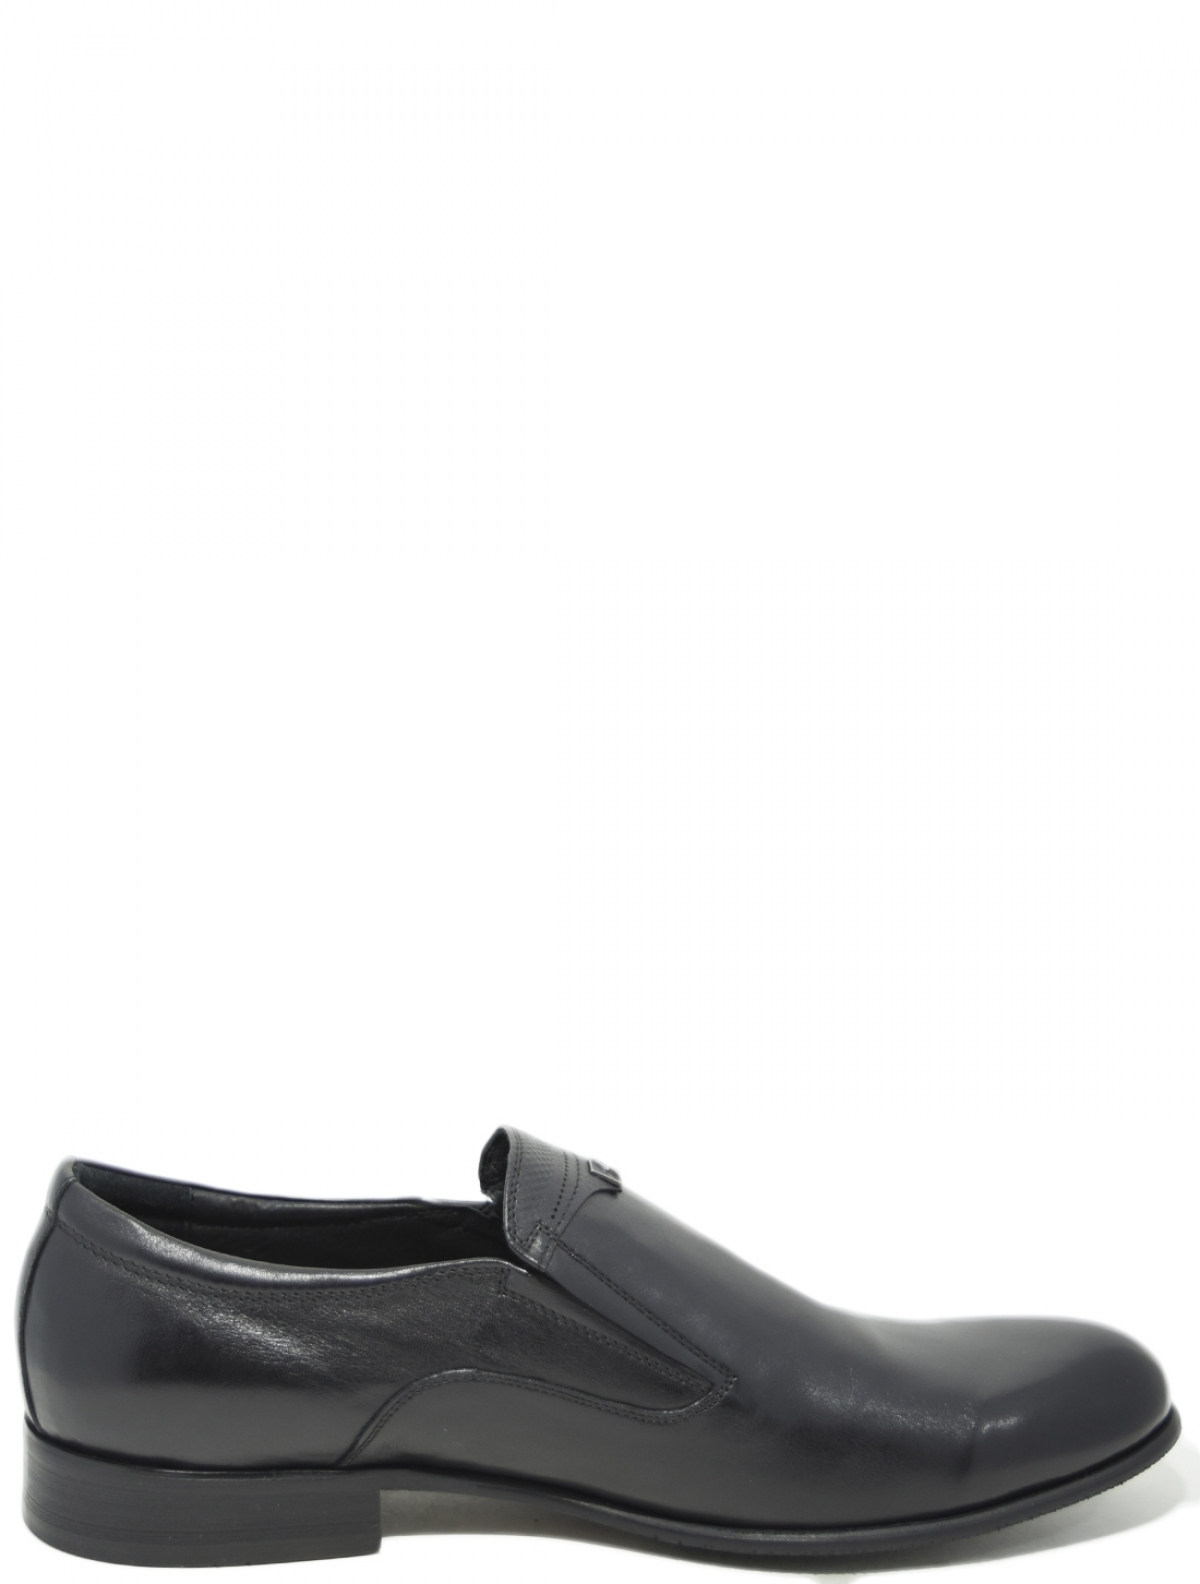 Rosconi R87205YJ-428-9546 мужские туфли